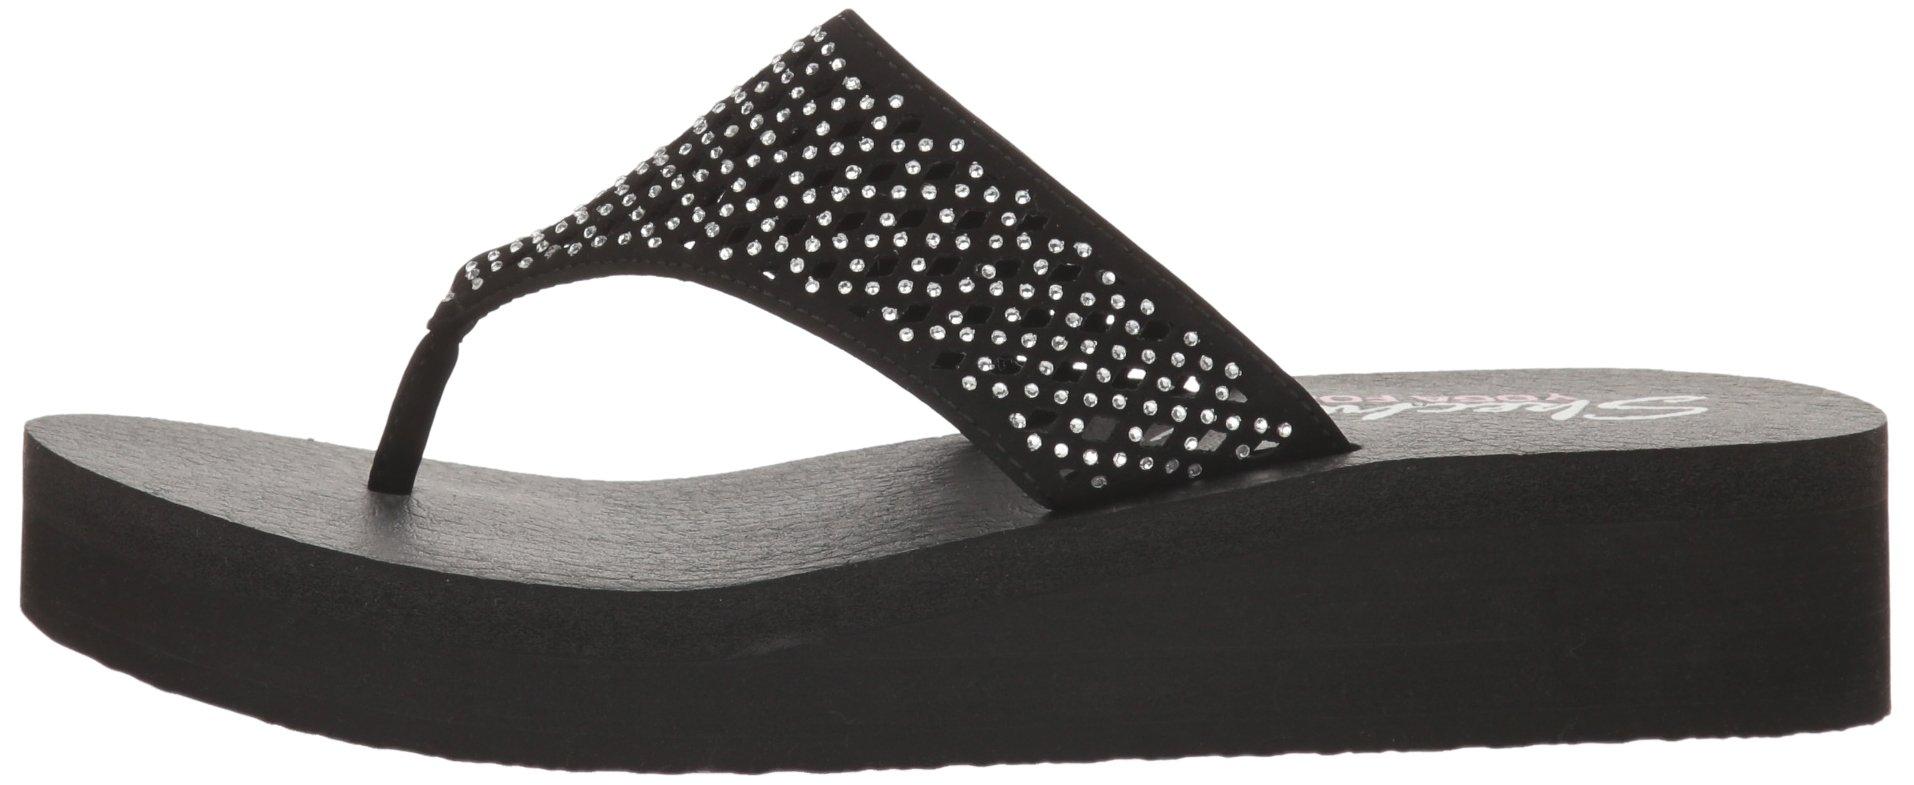 Skechers Cali Women's Vinyasa Flow Wedge Sandal, Black Cutout, 6 B(M) US by Skechers (Image #5)